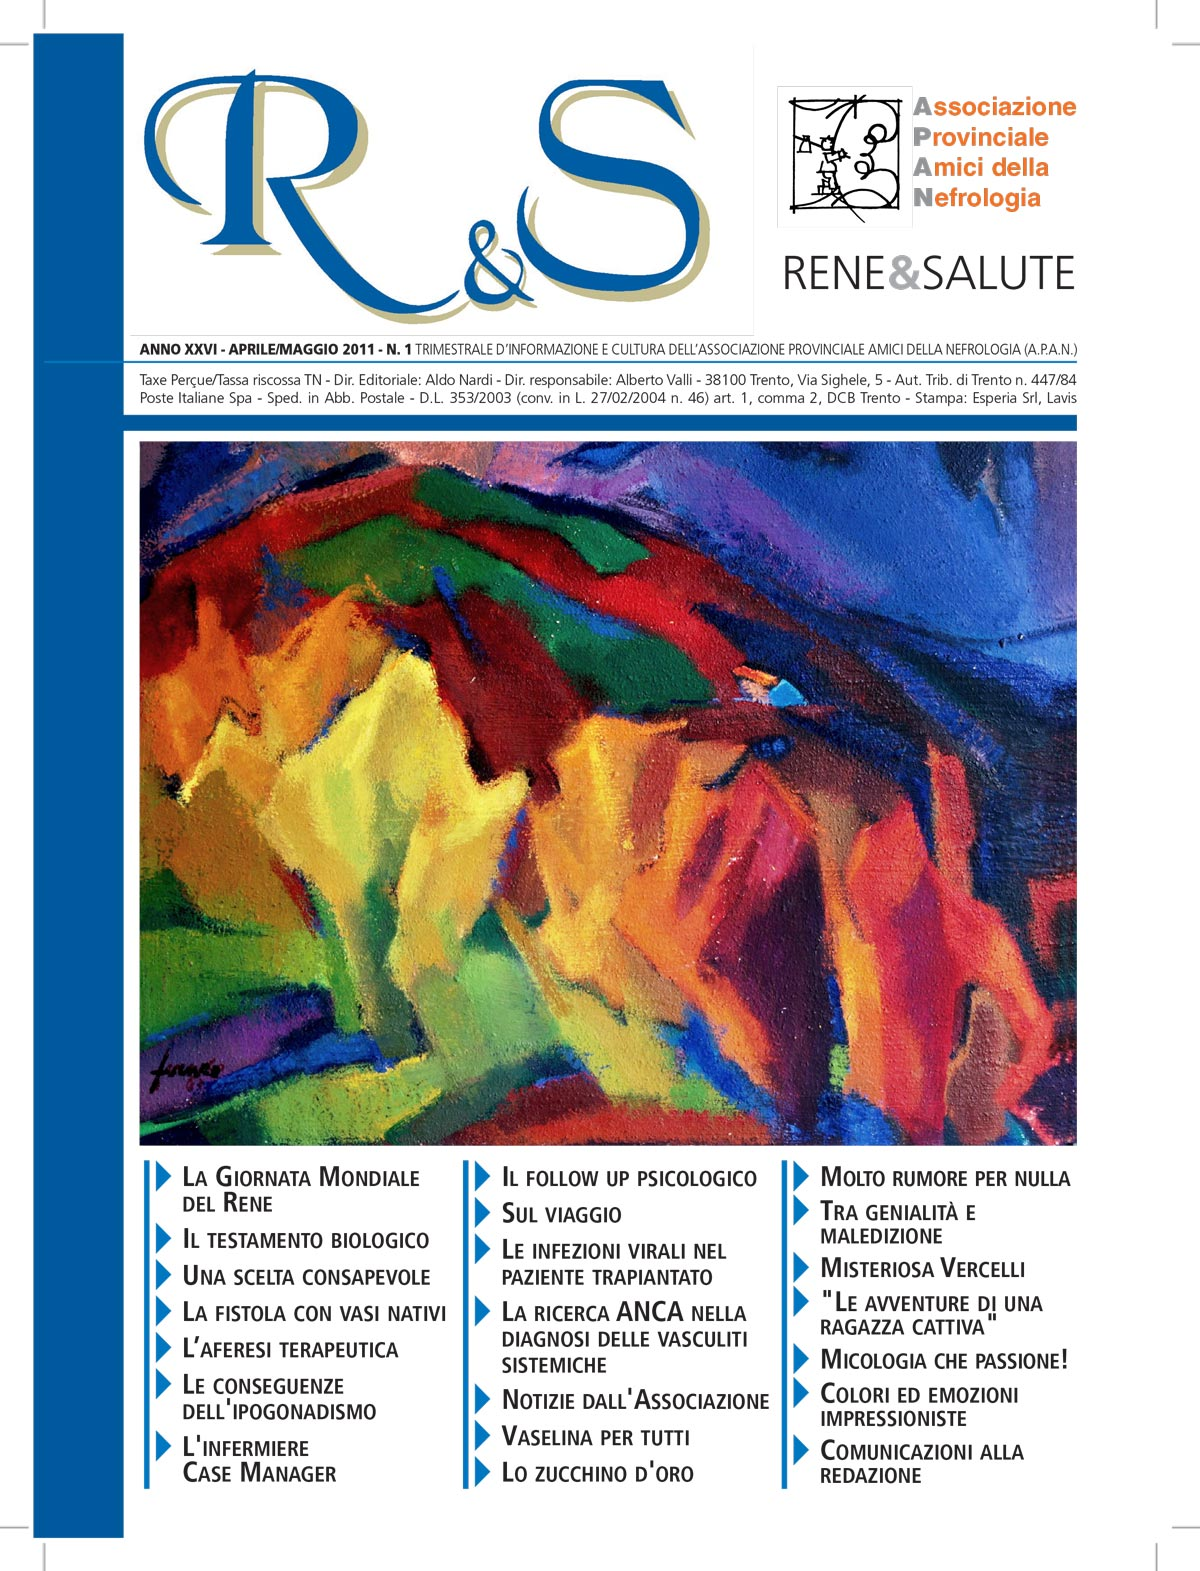 Rene & Salute 2011.1